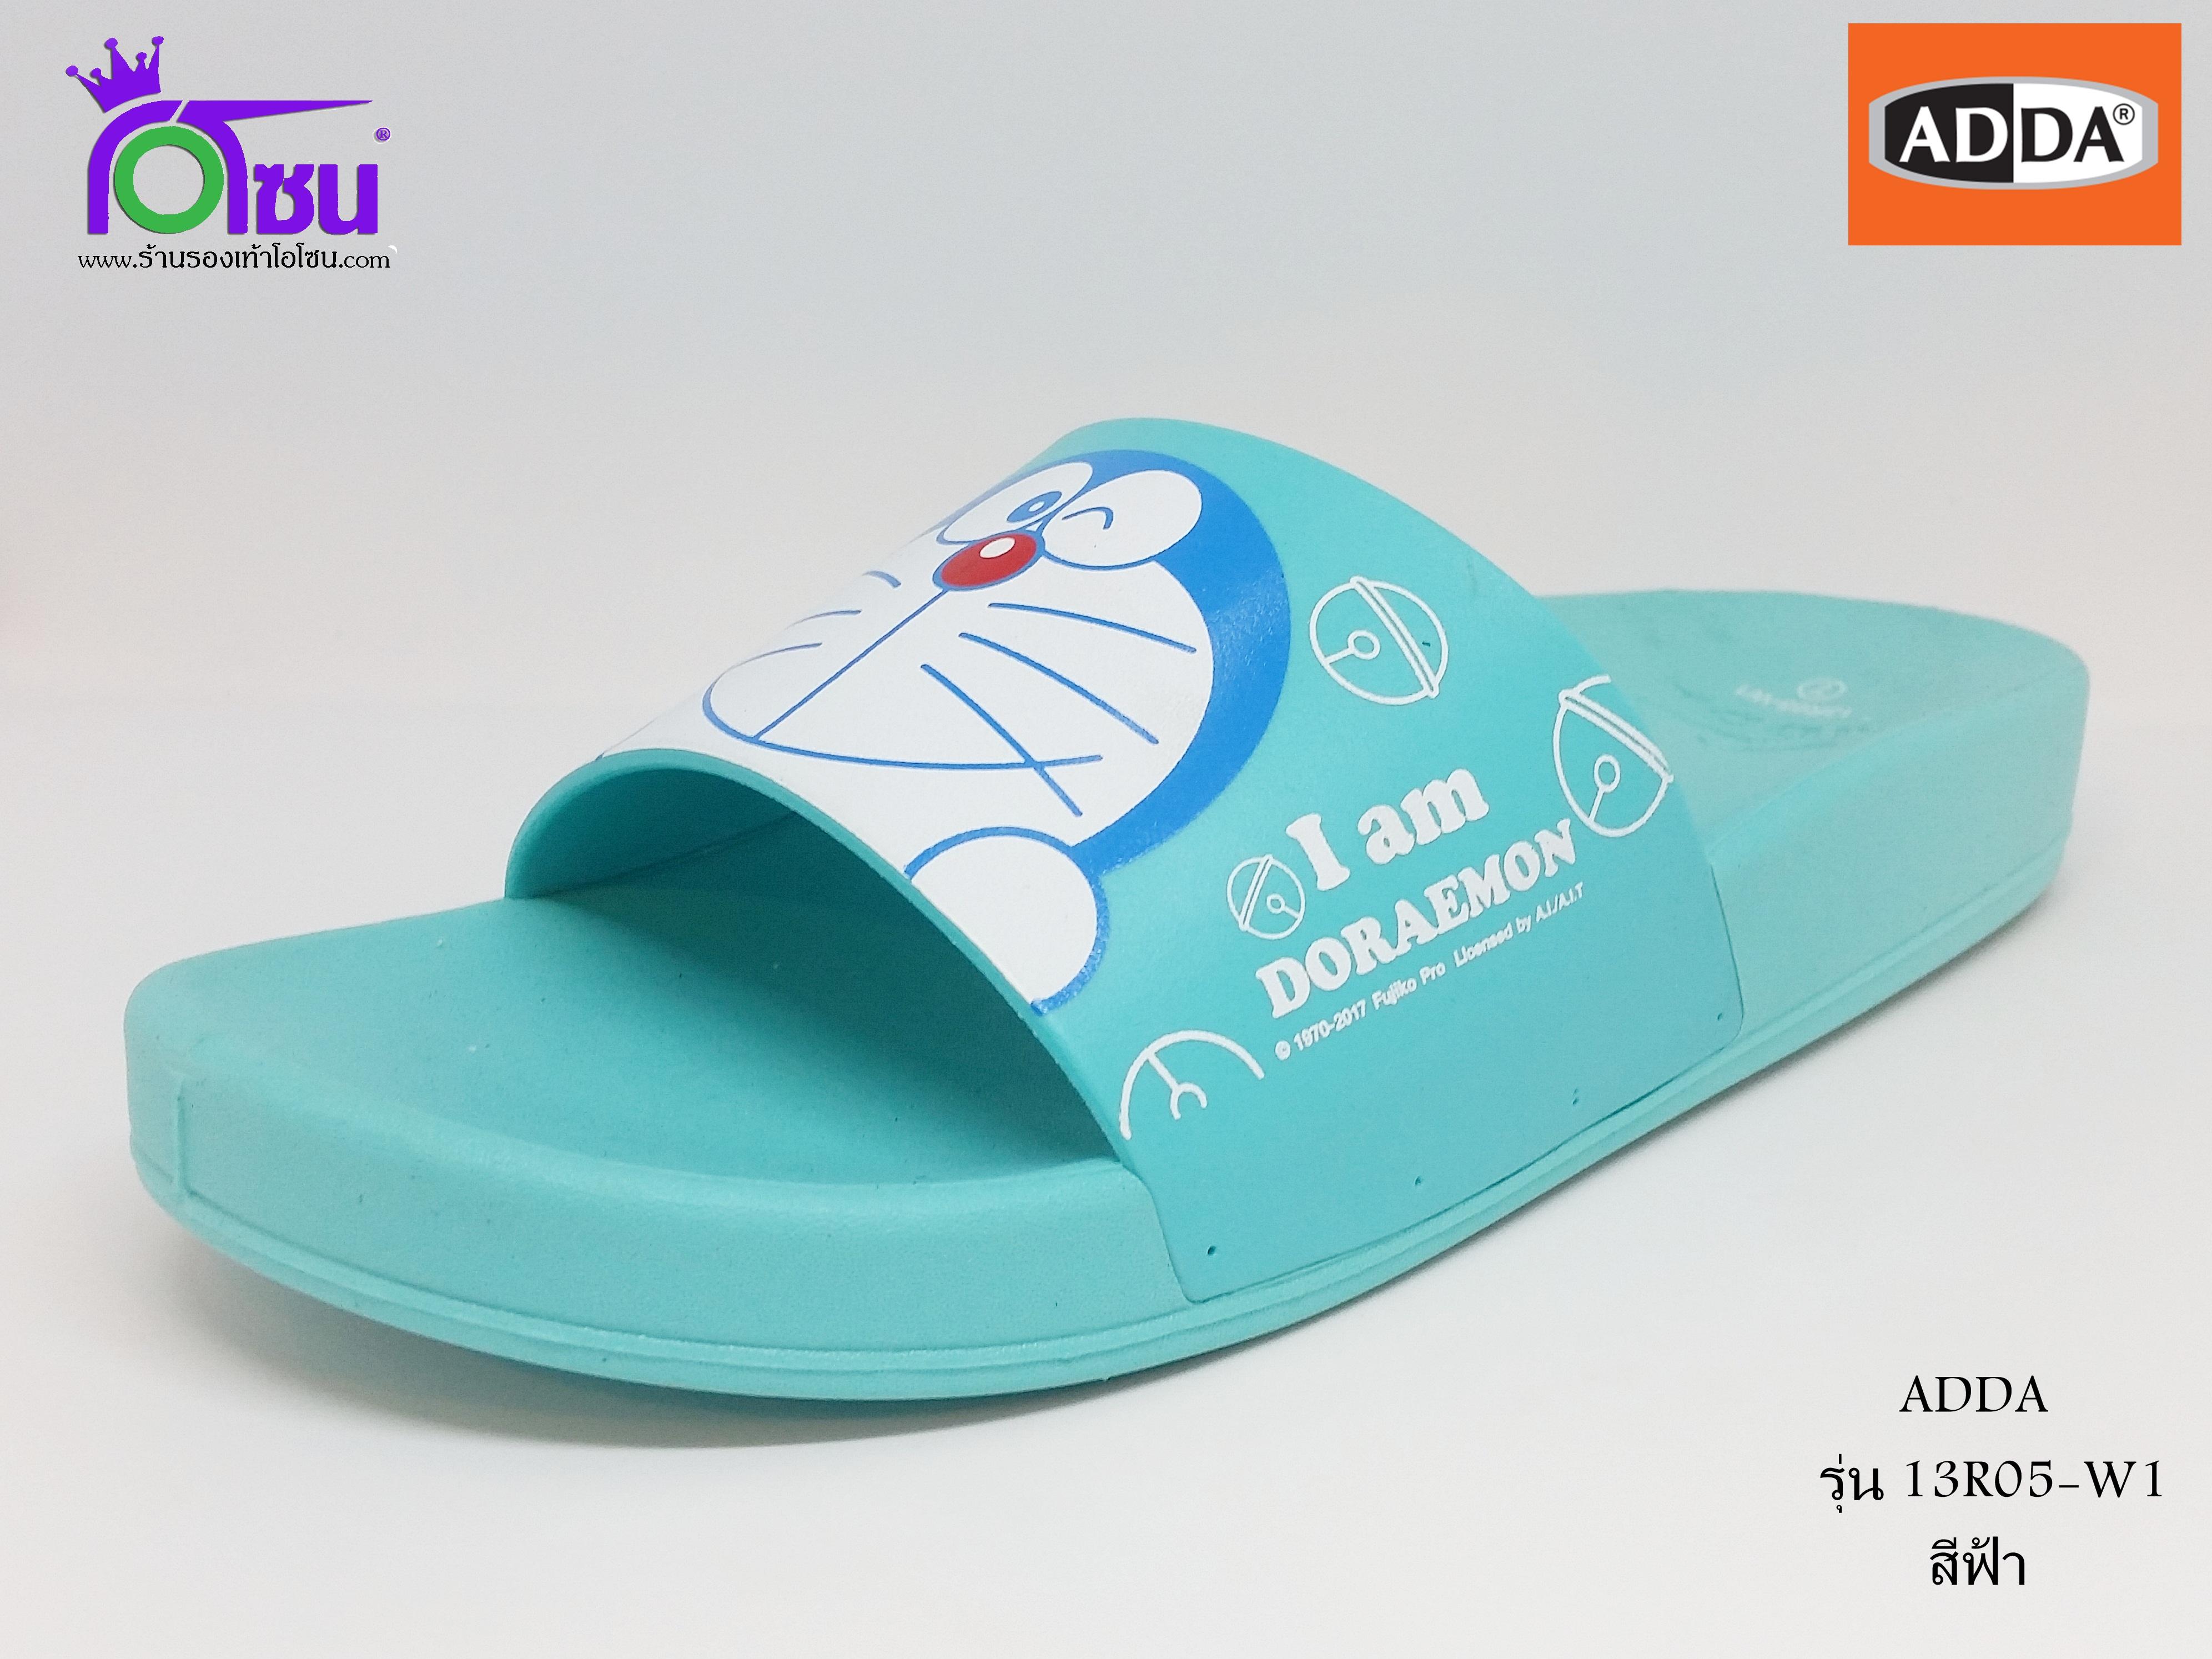 ADDA Doraemon แอ๊ดด้า โดราเอมอน รหัส 13R05-W1 สีฟ้า เบอร์ 4-7